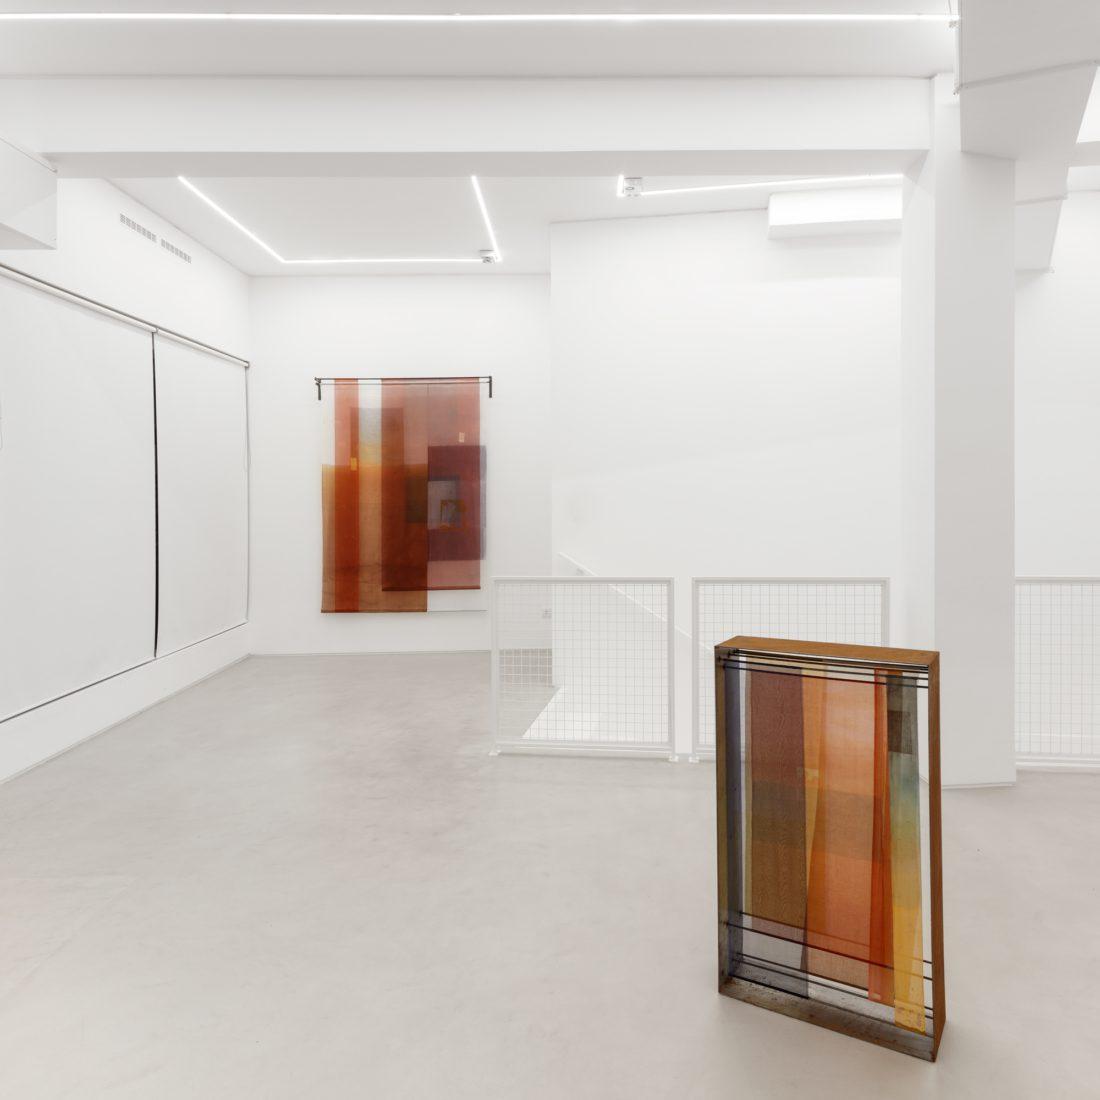 Foco Galeria Gaze To See, Gauze To Perceive